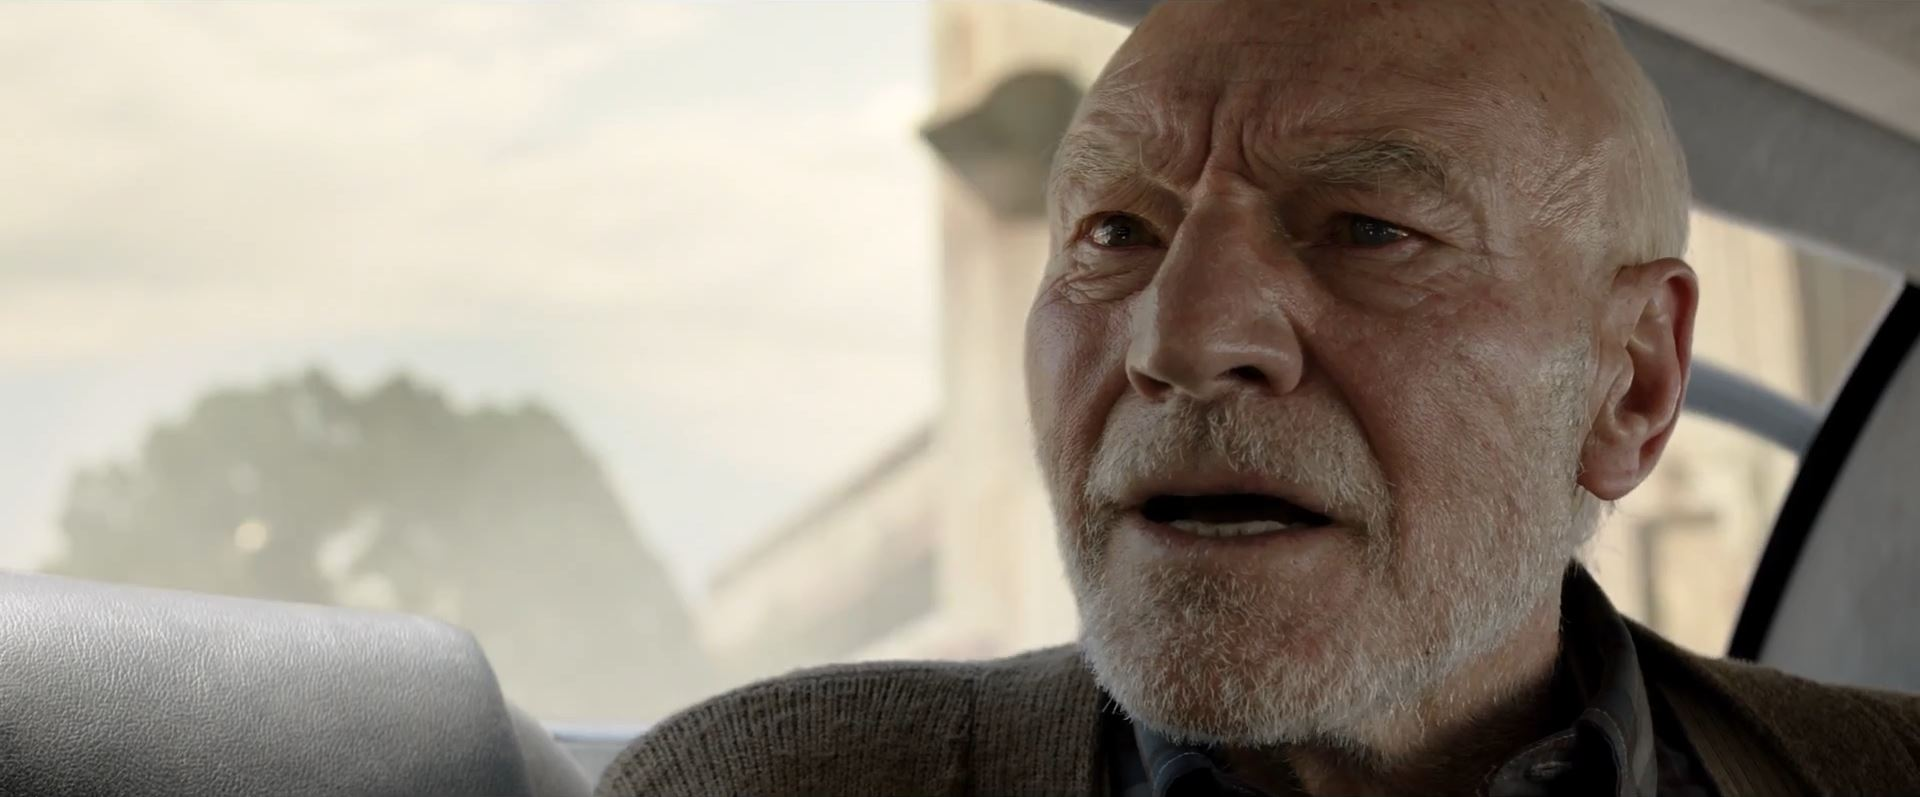 Patrick Stewart as Professor X in Logan - Super Bowl Trailers